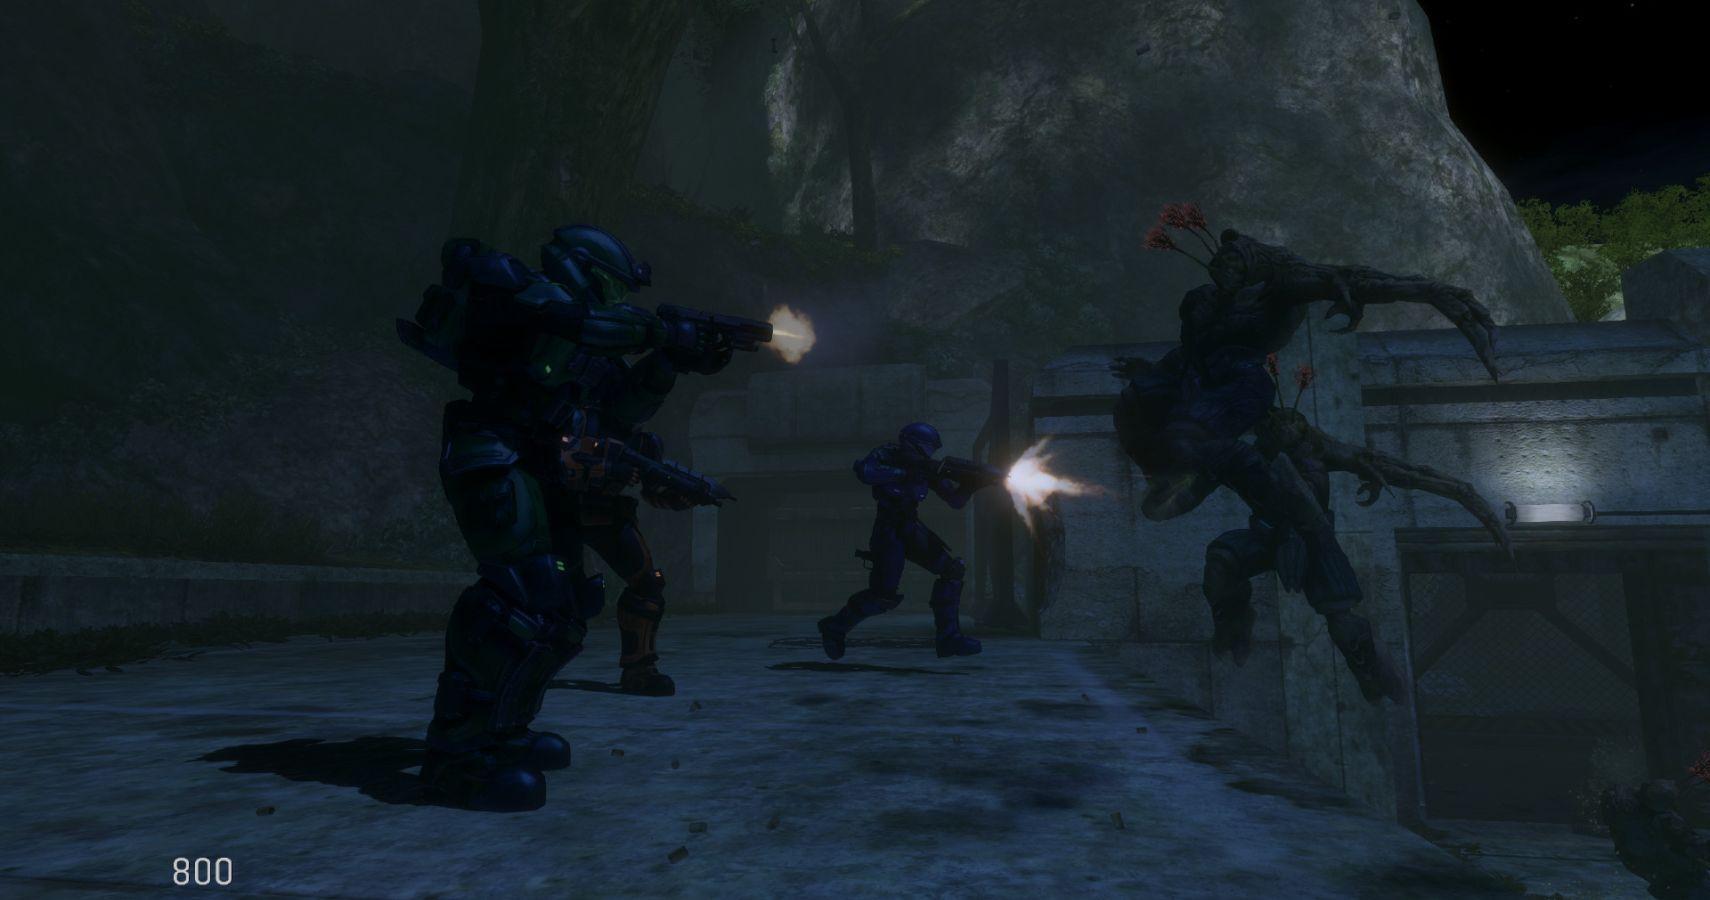 Fan Adds Zombie Mode To Halo 3